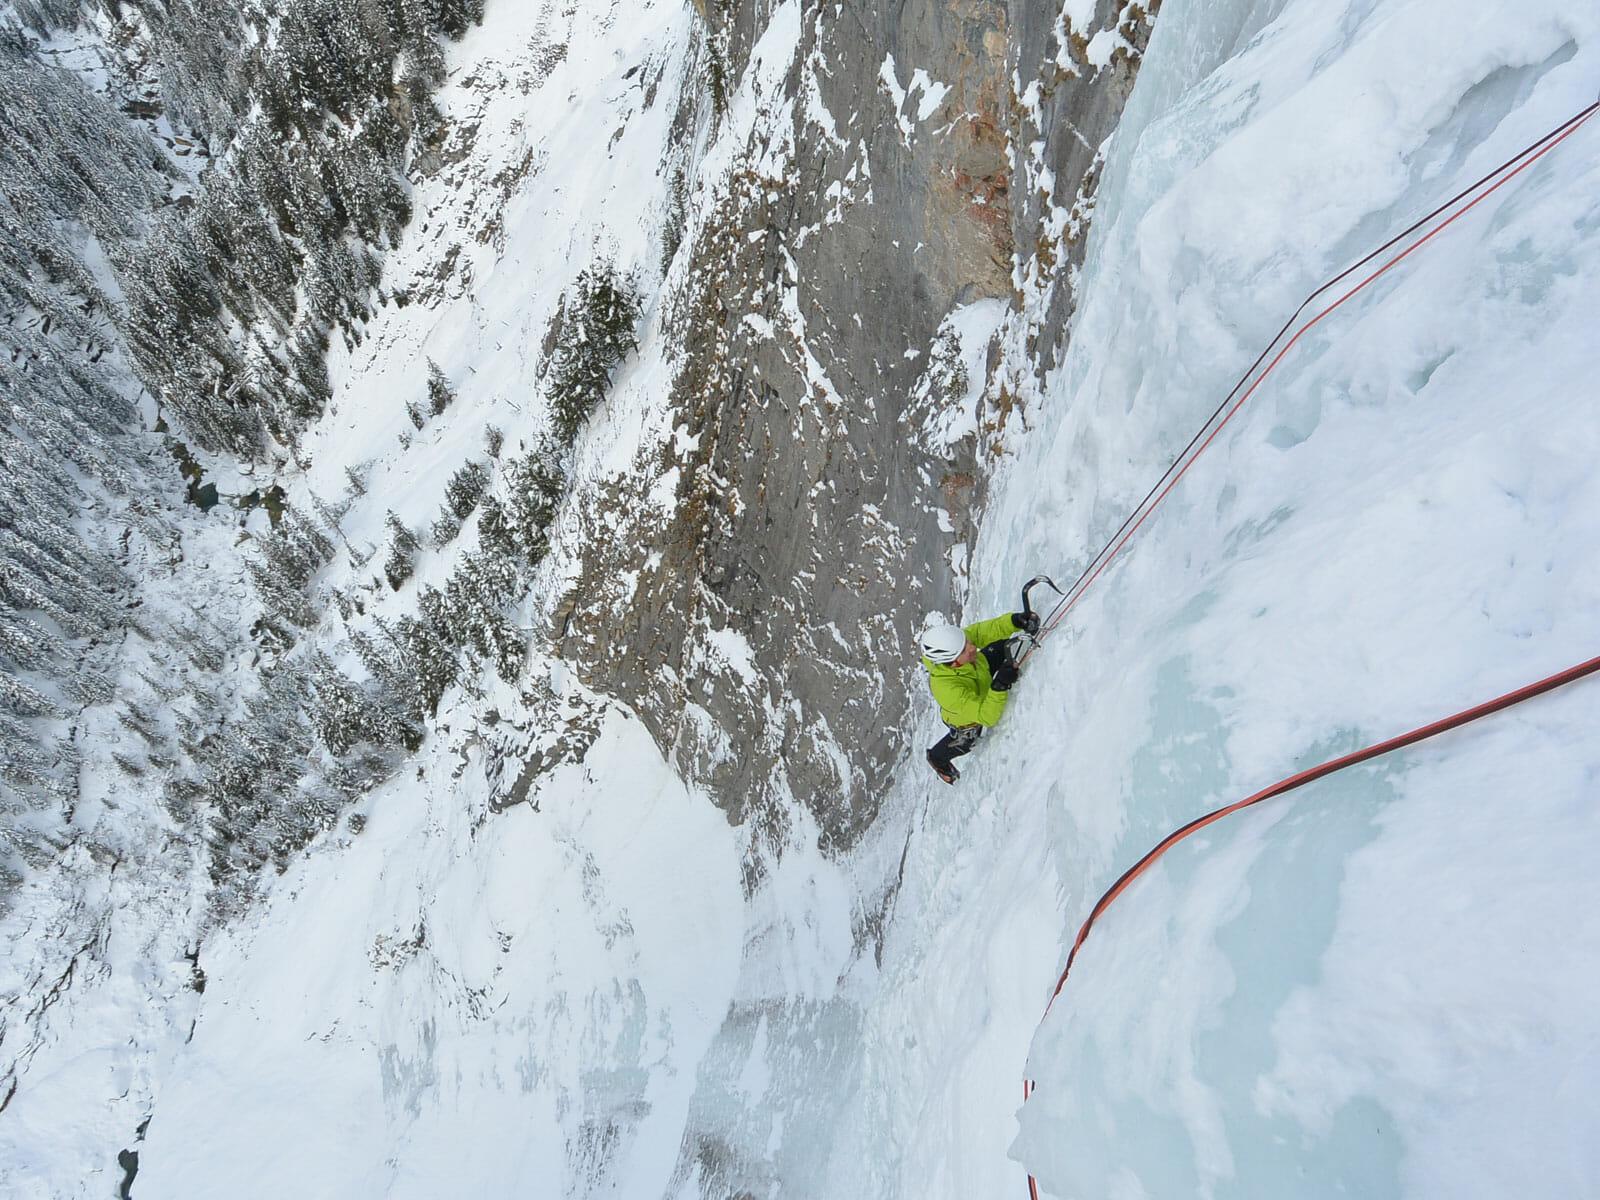 Klettergurt Eisklettern : Eisklettern technikkurs pontresina bergsteigerschule